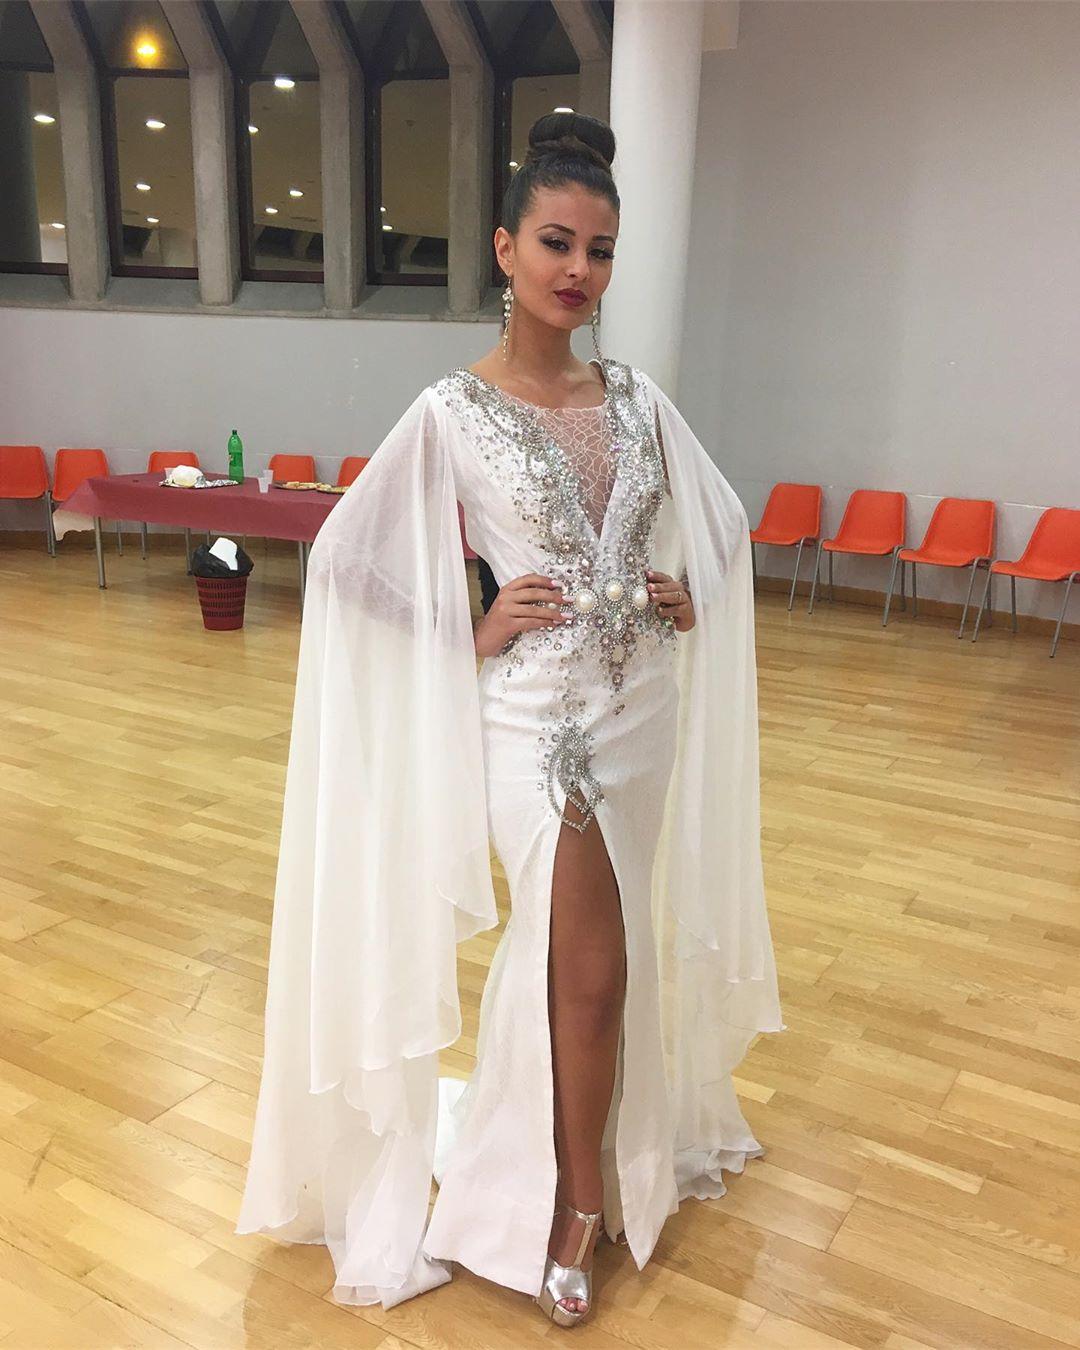 aitana jimenez, miss supranational spain 2019. 59799010